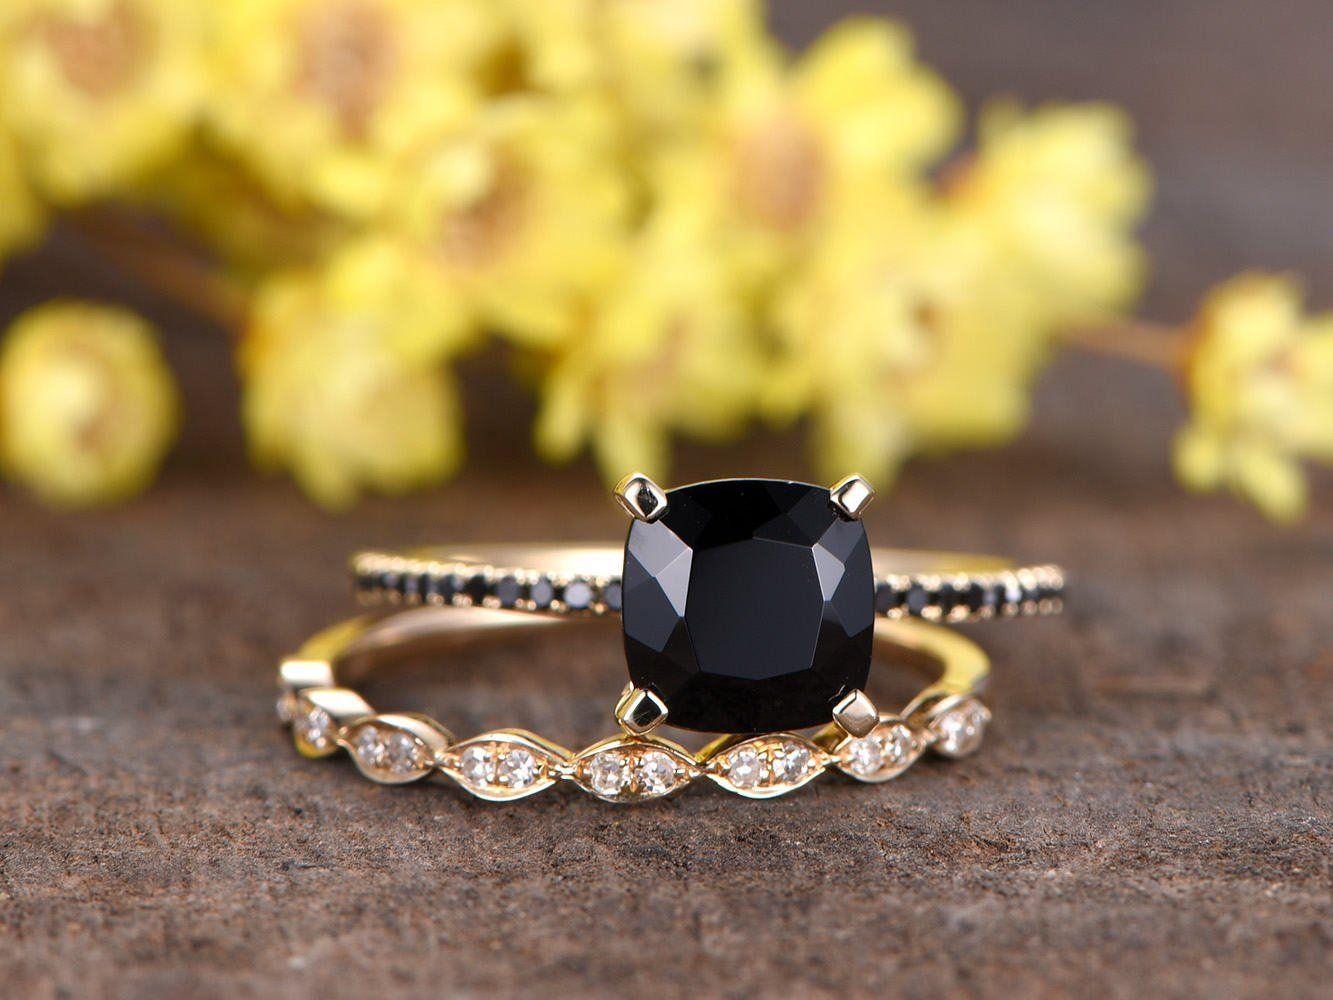 7mm Cushion Black Spinel Engagement Ringblack Diamond Wedding Etsy Black Diamond Ring Engagement Black Diamond Wedding Bands Black Engagement Ring